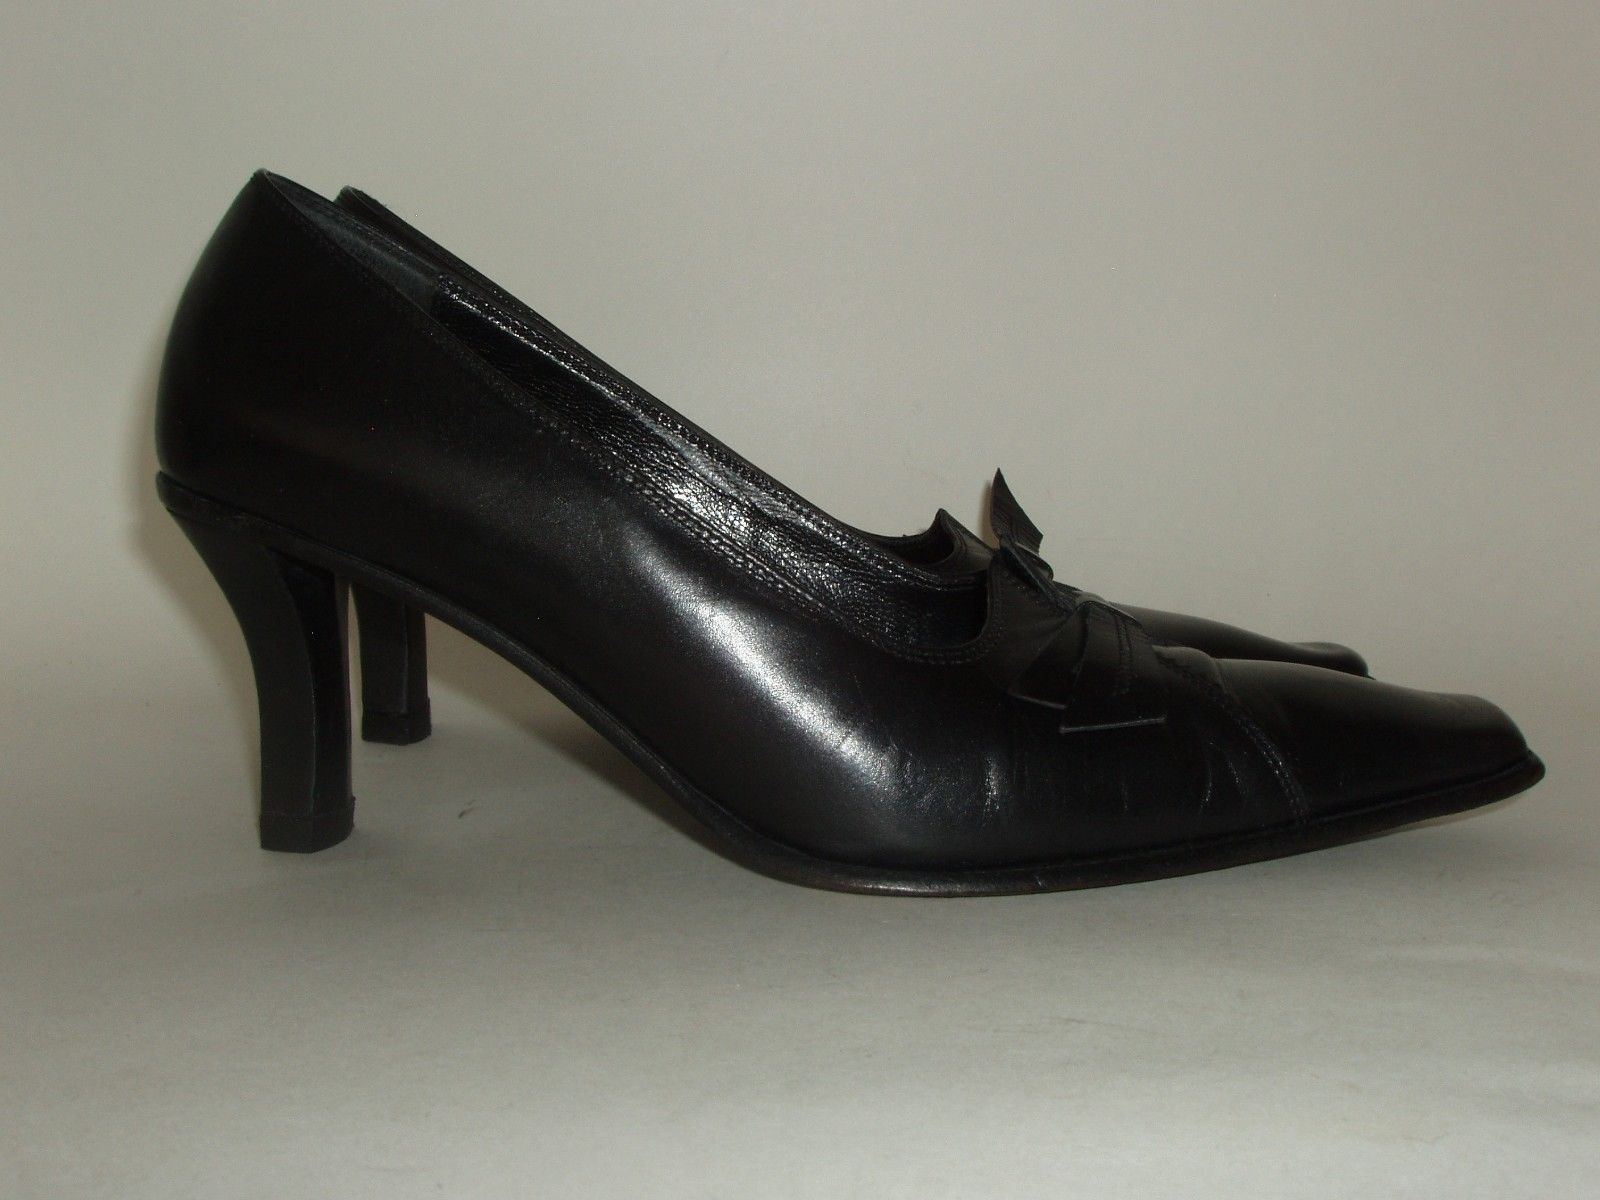 Roberto Botticelli Italian Made Black Leather High Heel Shoes Euro 37.5 US 7.5 image 5